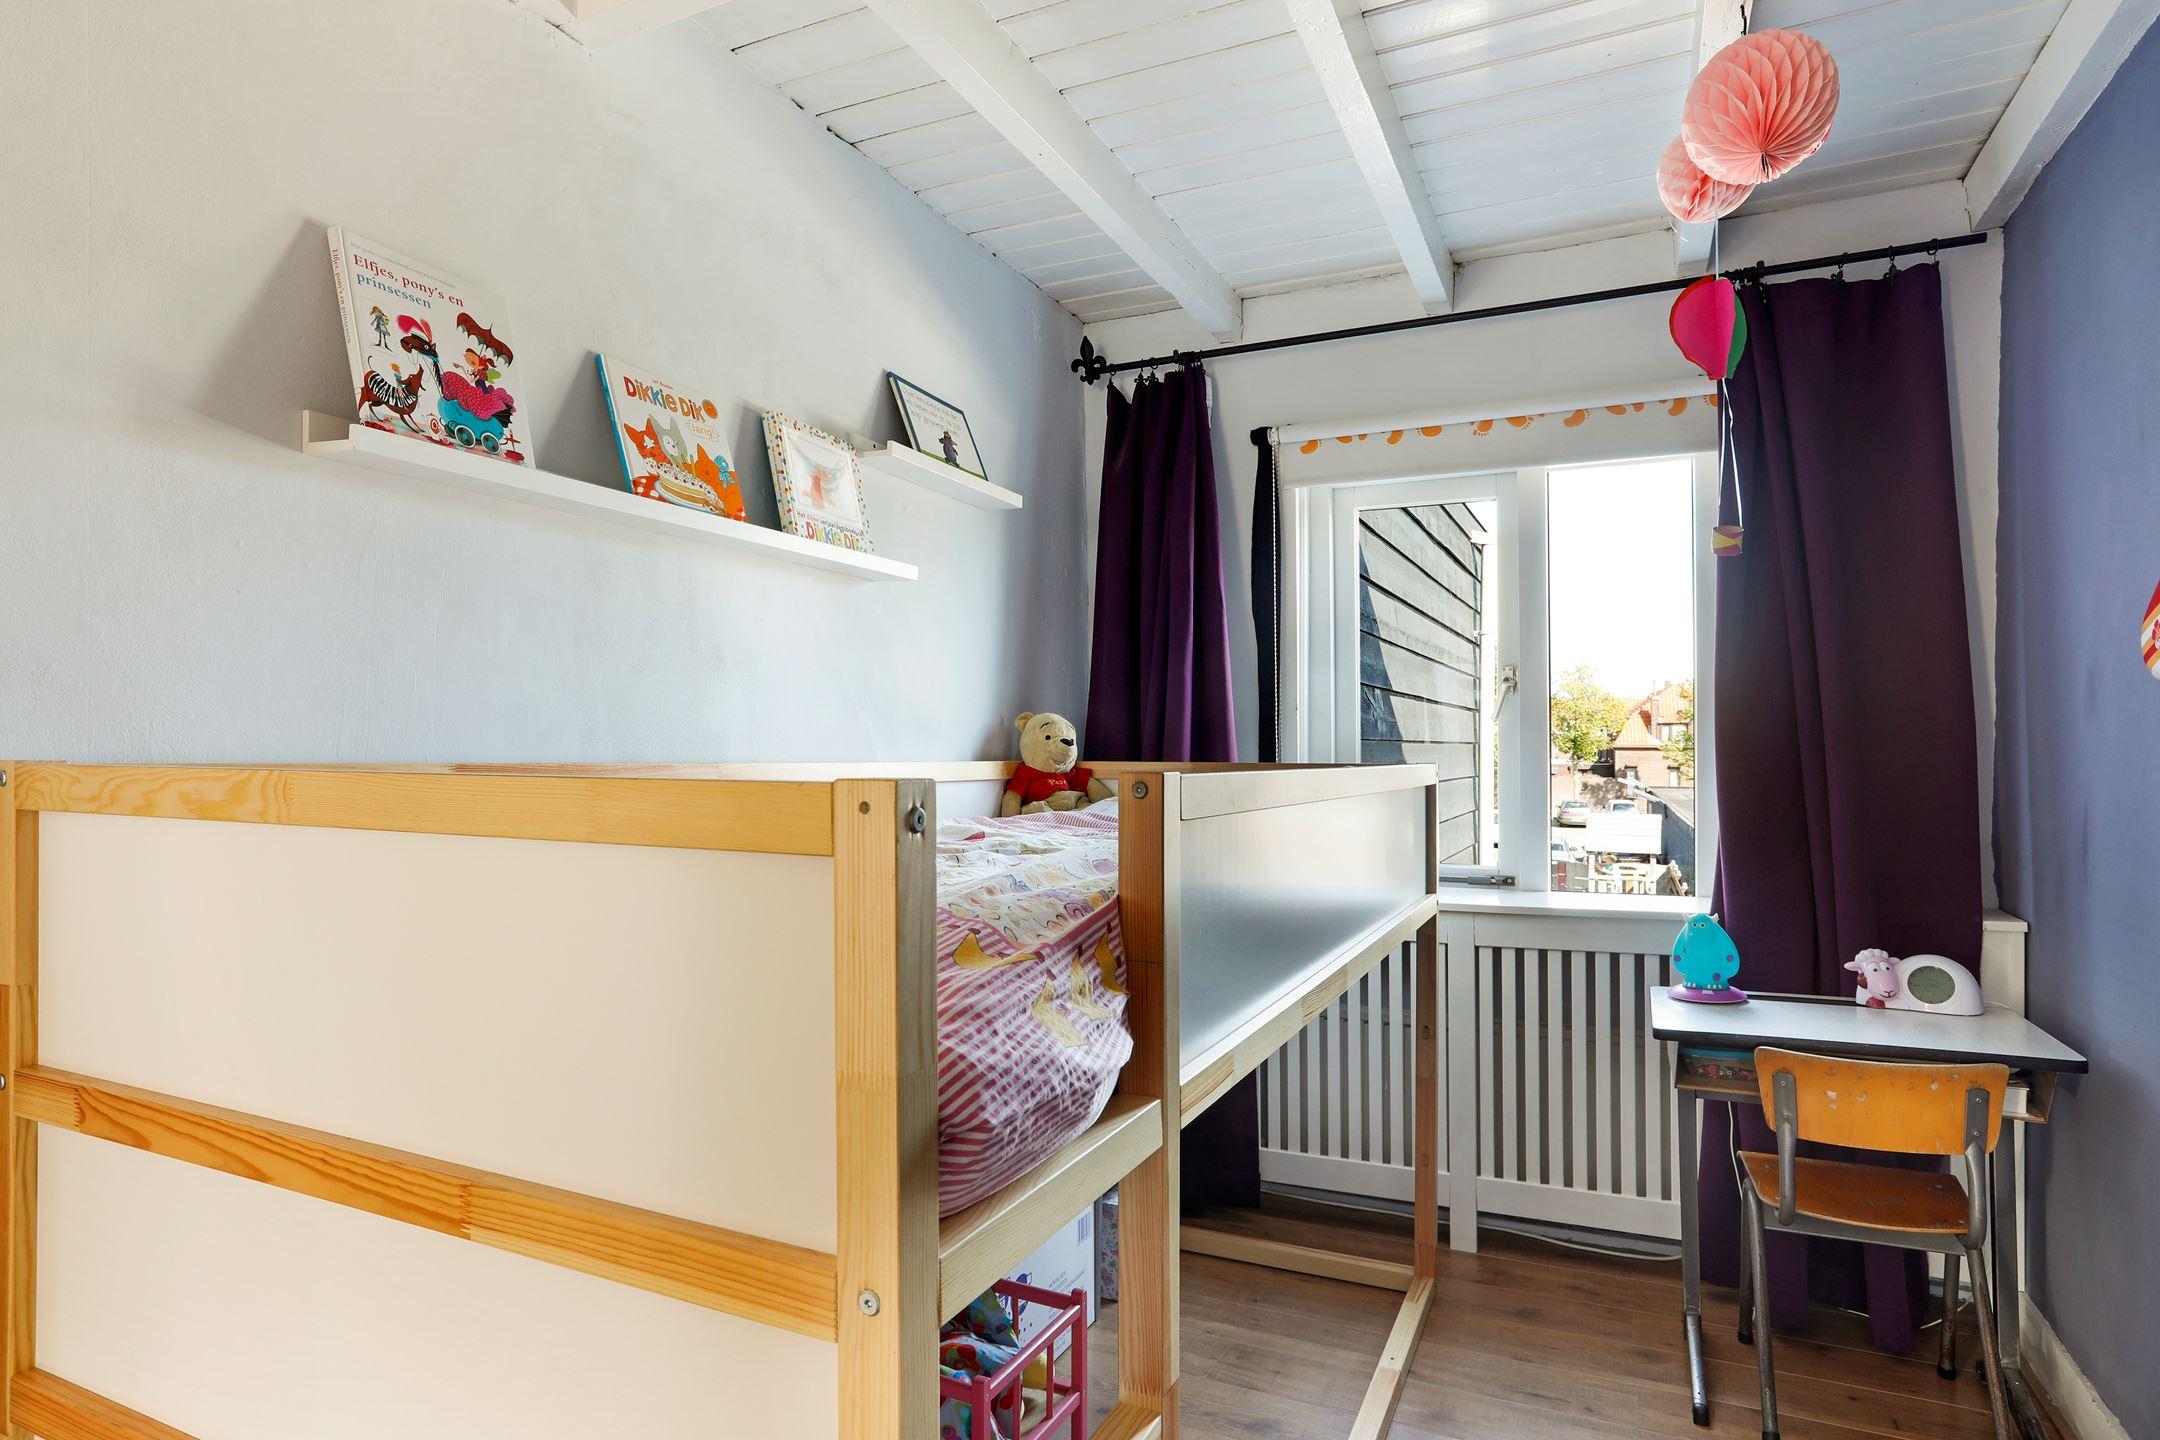 Prinsessen Spullen Slaapkamer : Huis te koop: lovensestraat 158 5014 dv tilburg [funda]